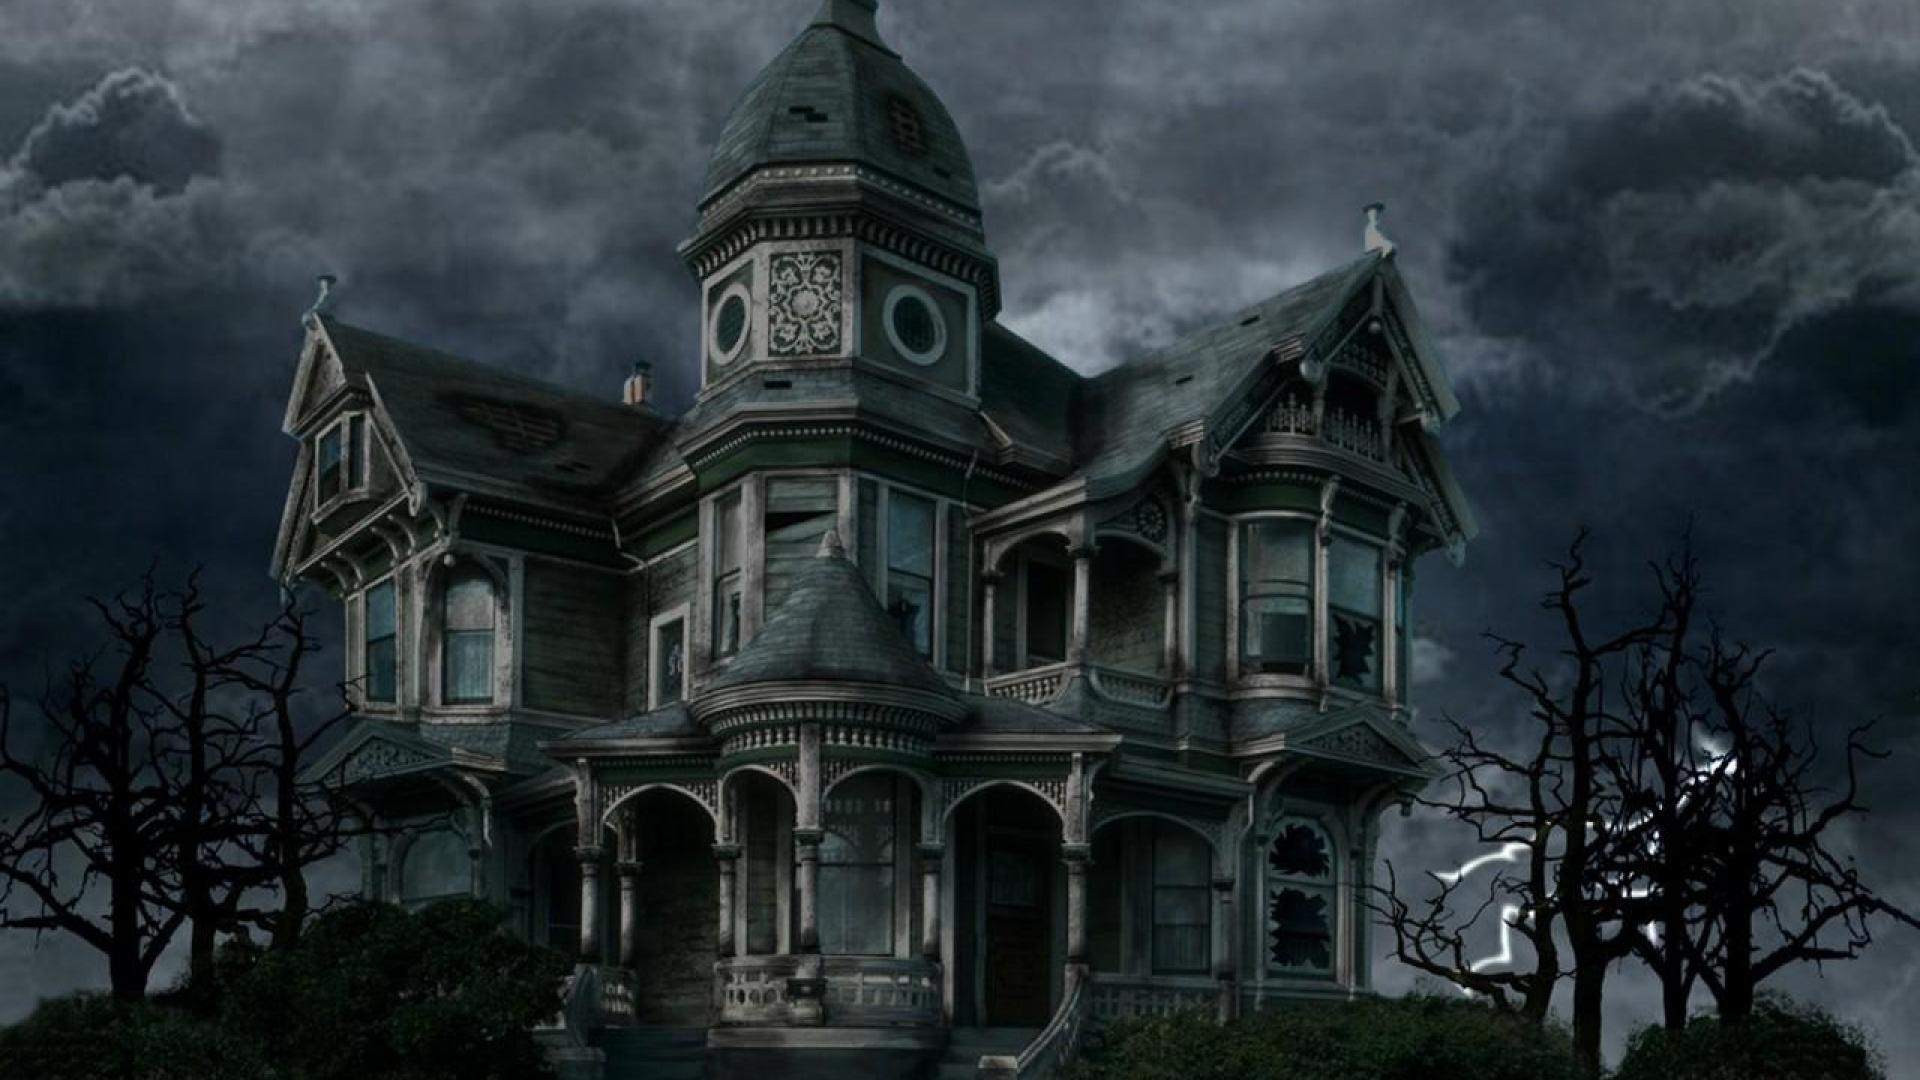 haunted house wallpaper HD 1920x1080